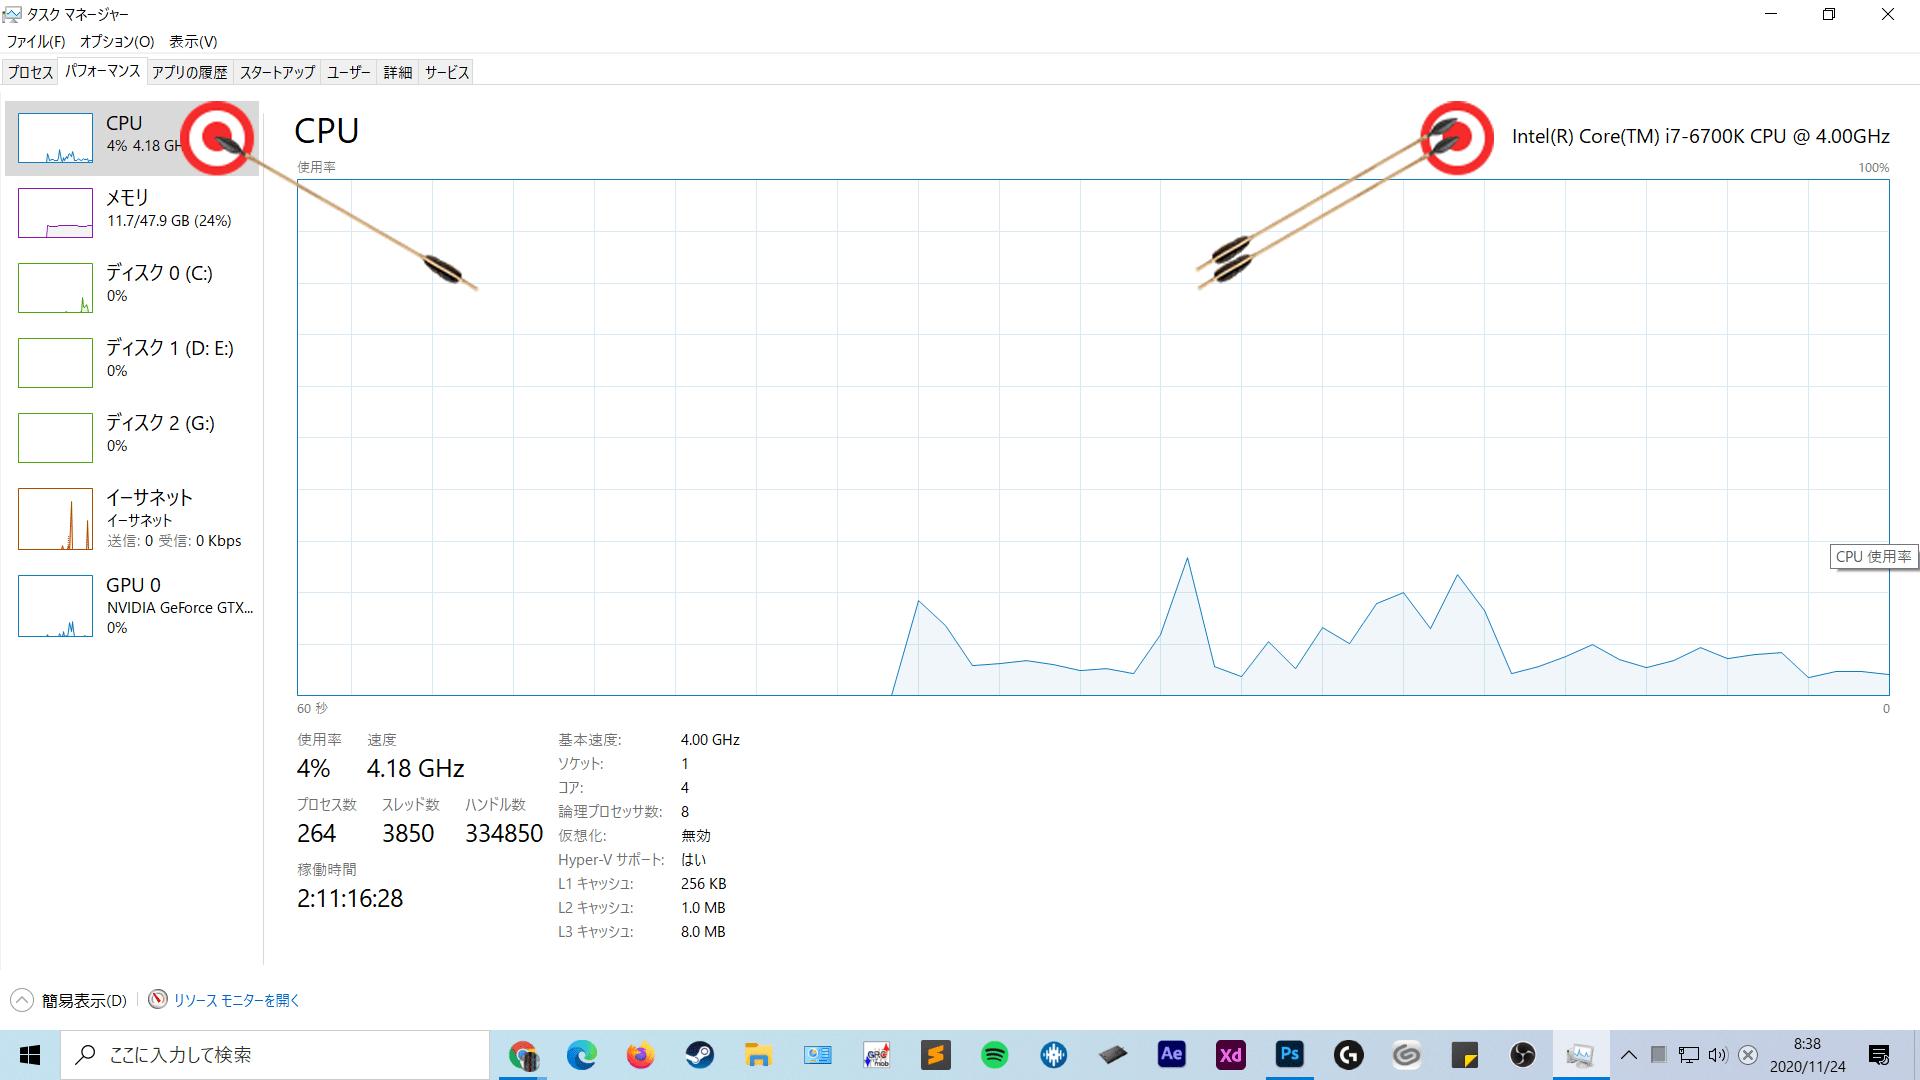 CPU スペックを確認